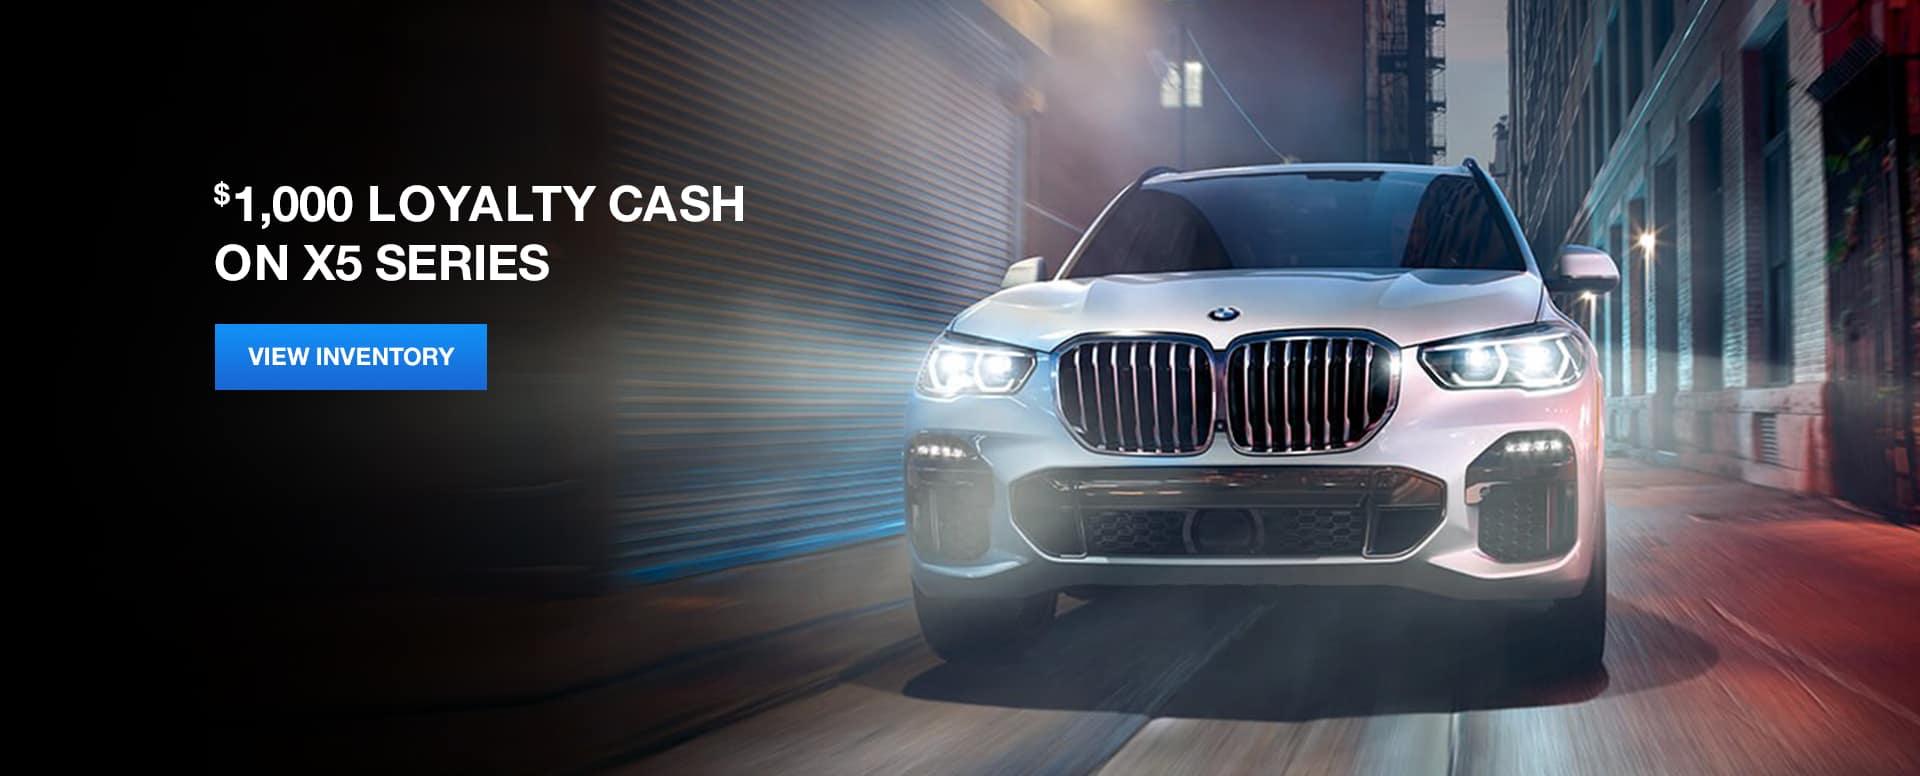 X5 Series Loyalty Cash Offer